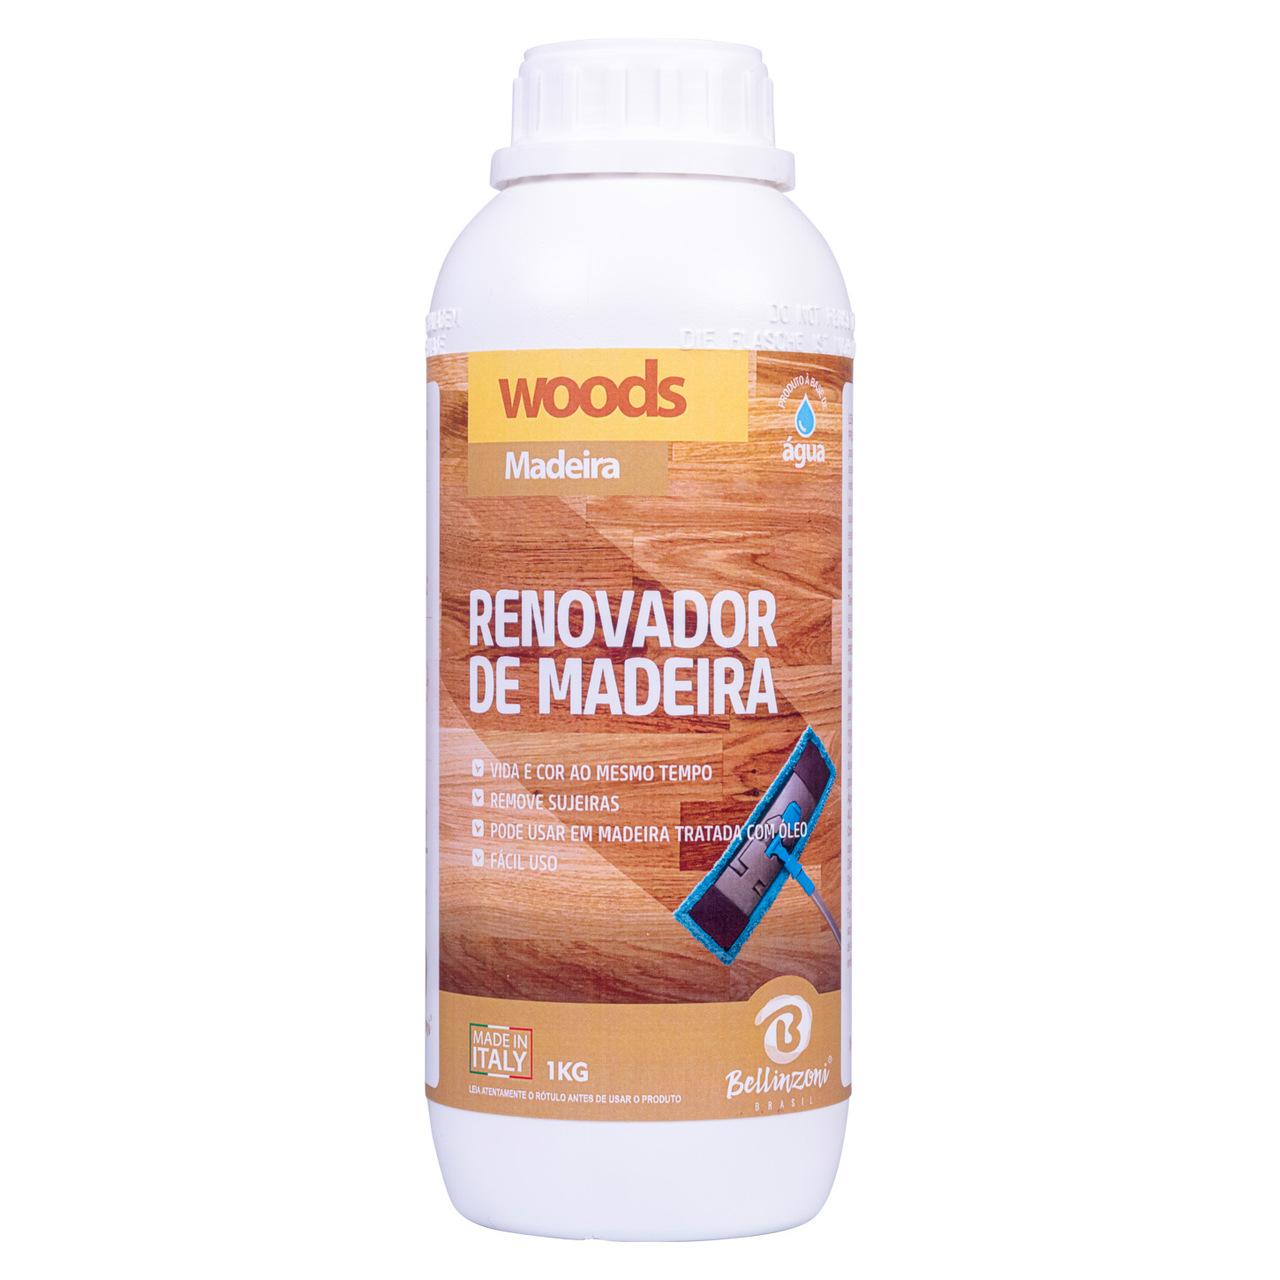 Renovador Woods para madeira Bellinzoni 1kg